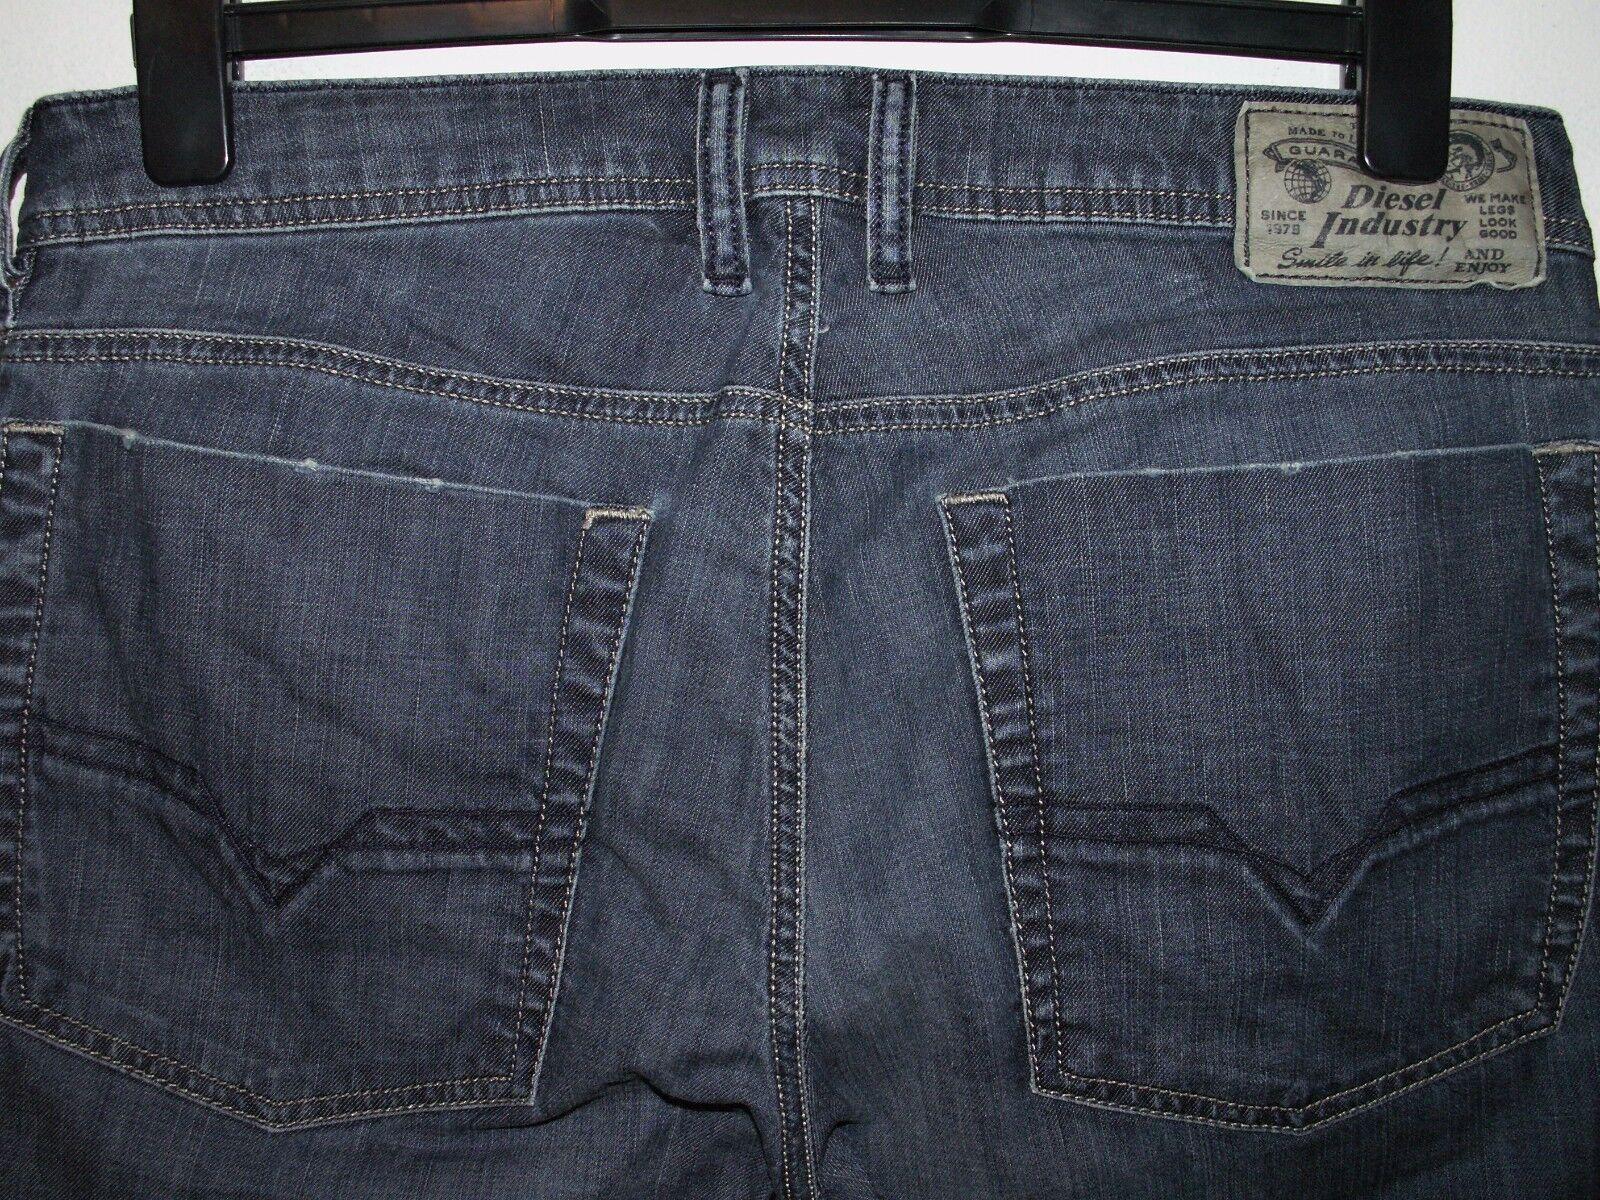 DIESEL ZATHAN Jeans avviocut Wash 0064M Stretch W32 L30 (a2655) (a2655) (a2655) 1e5801